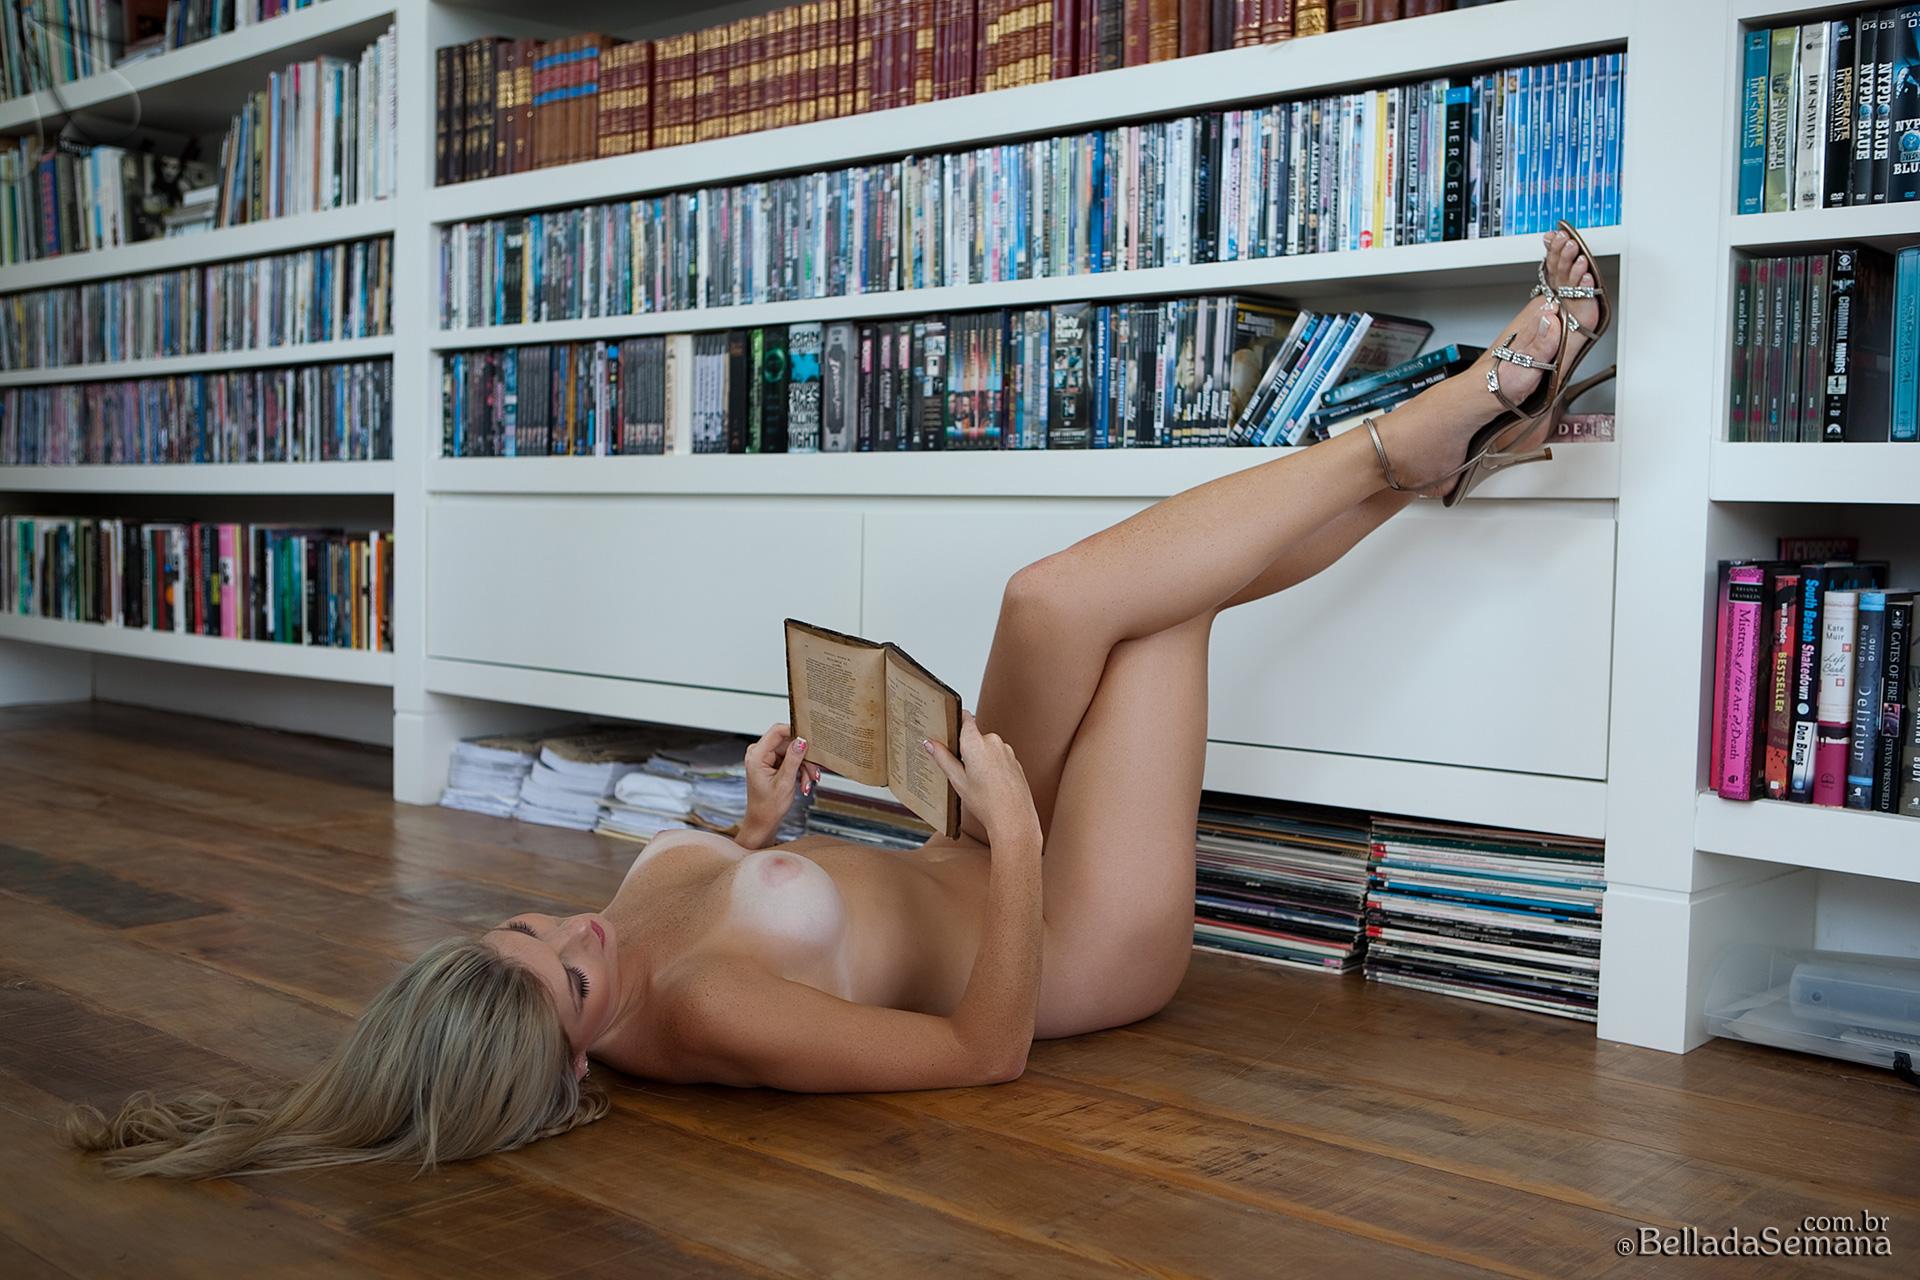 angelica-woicichoski-tan-lines-blonde-brazilian-bella-da-semana-25